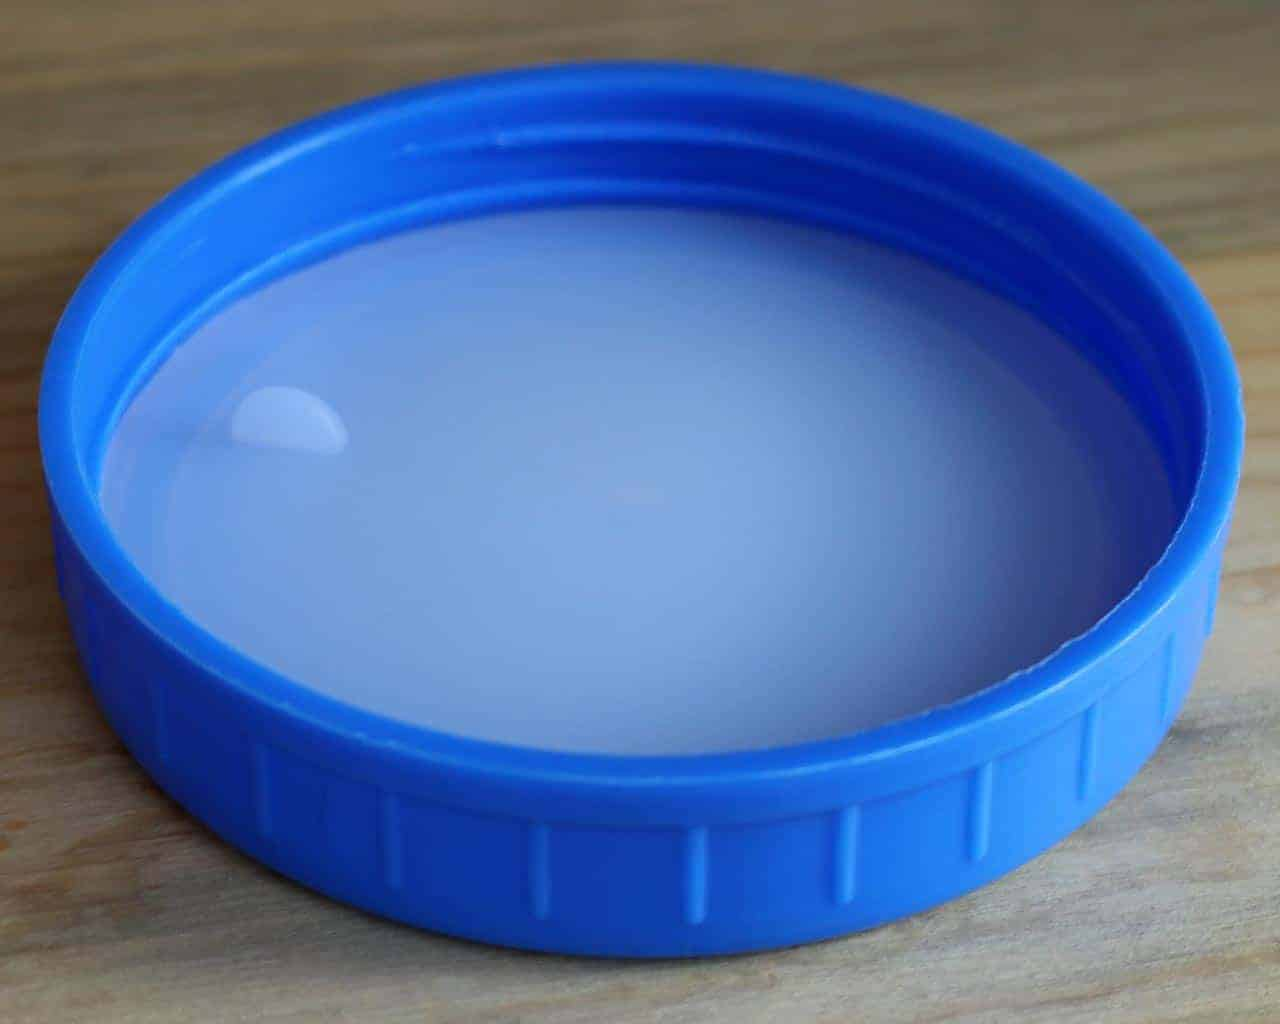 Mjl Leak Proof Plastic Storage Lids For Mason Jars